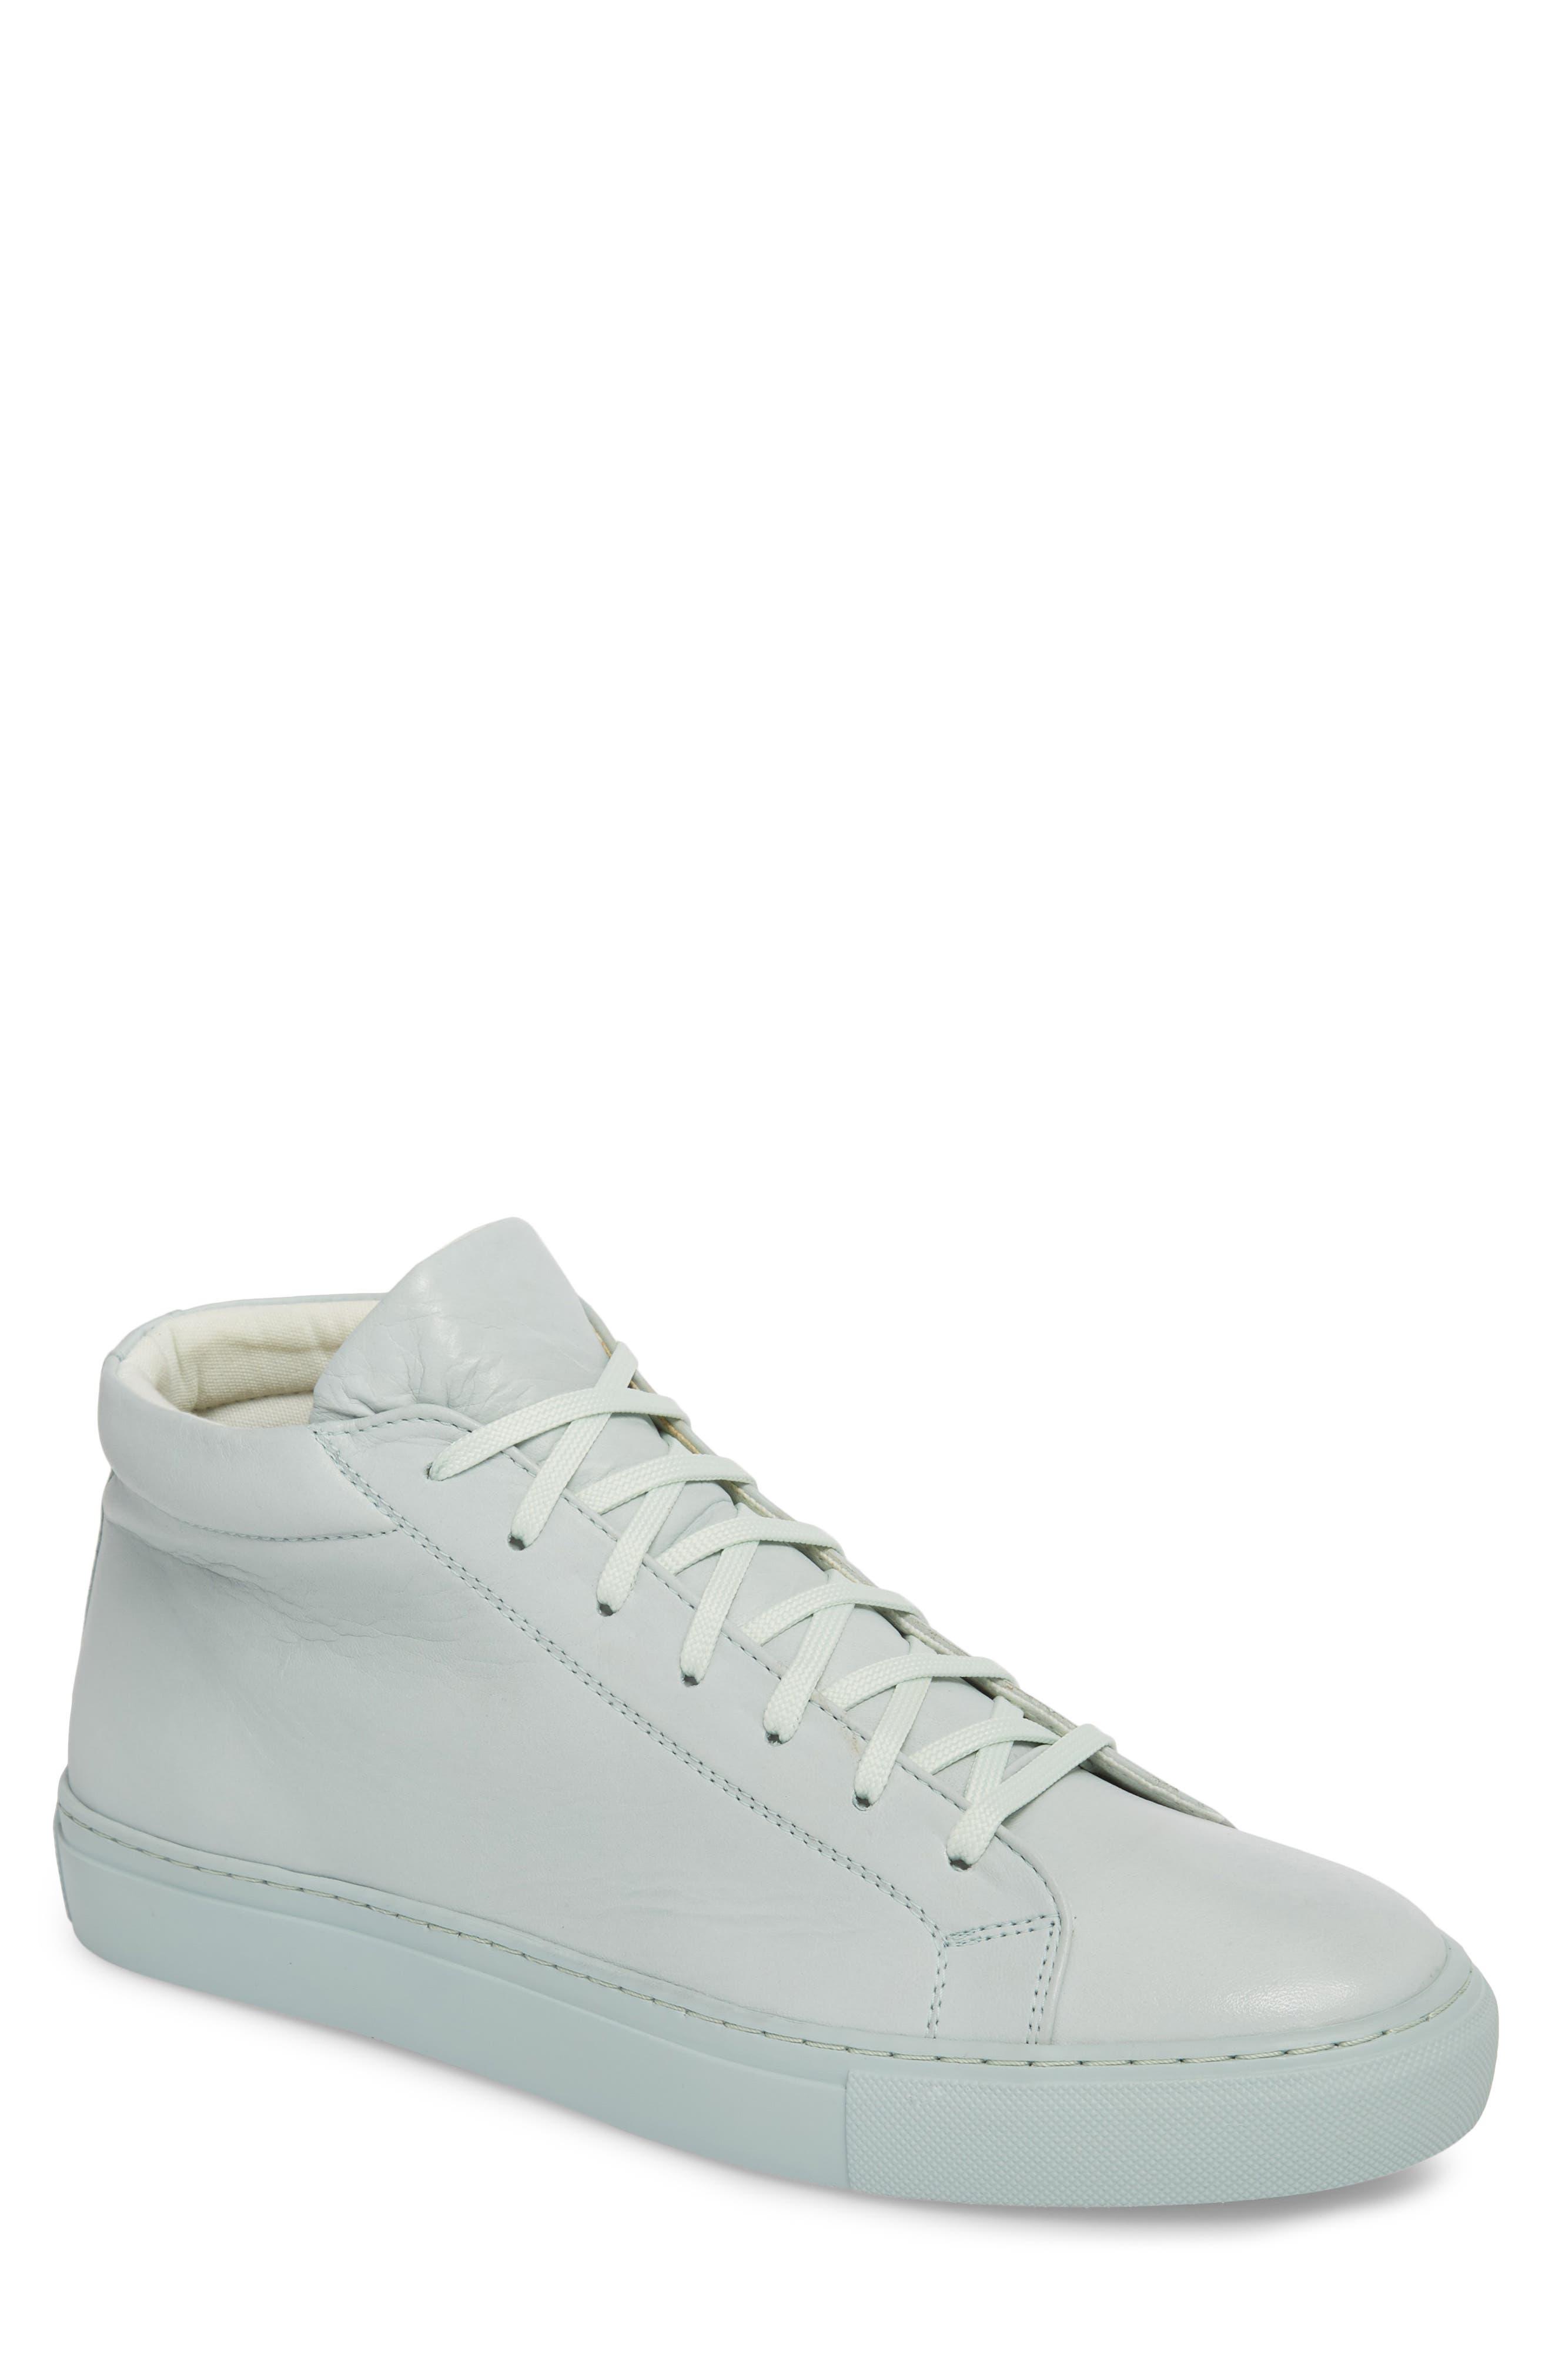 Lexington Mid Top Sneaker,                             Main thumbnail 1, color,                             Mint Green Leather